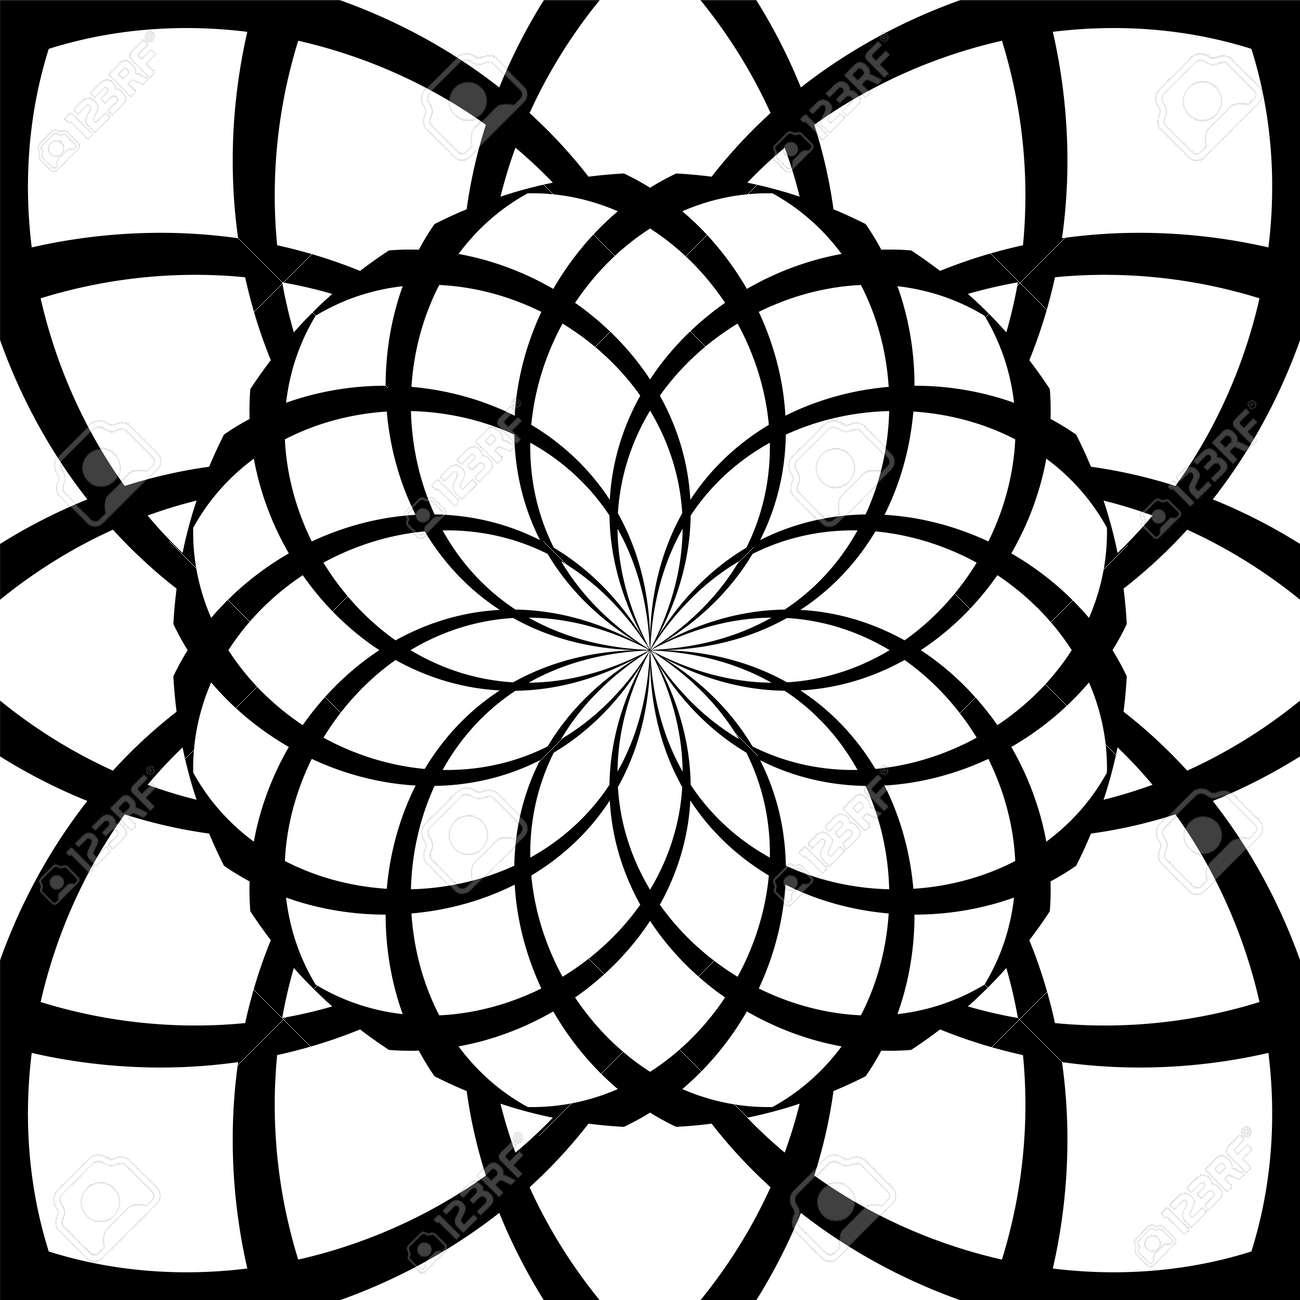 Vector illustration psychedelic spiral effect - 163385723